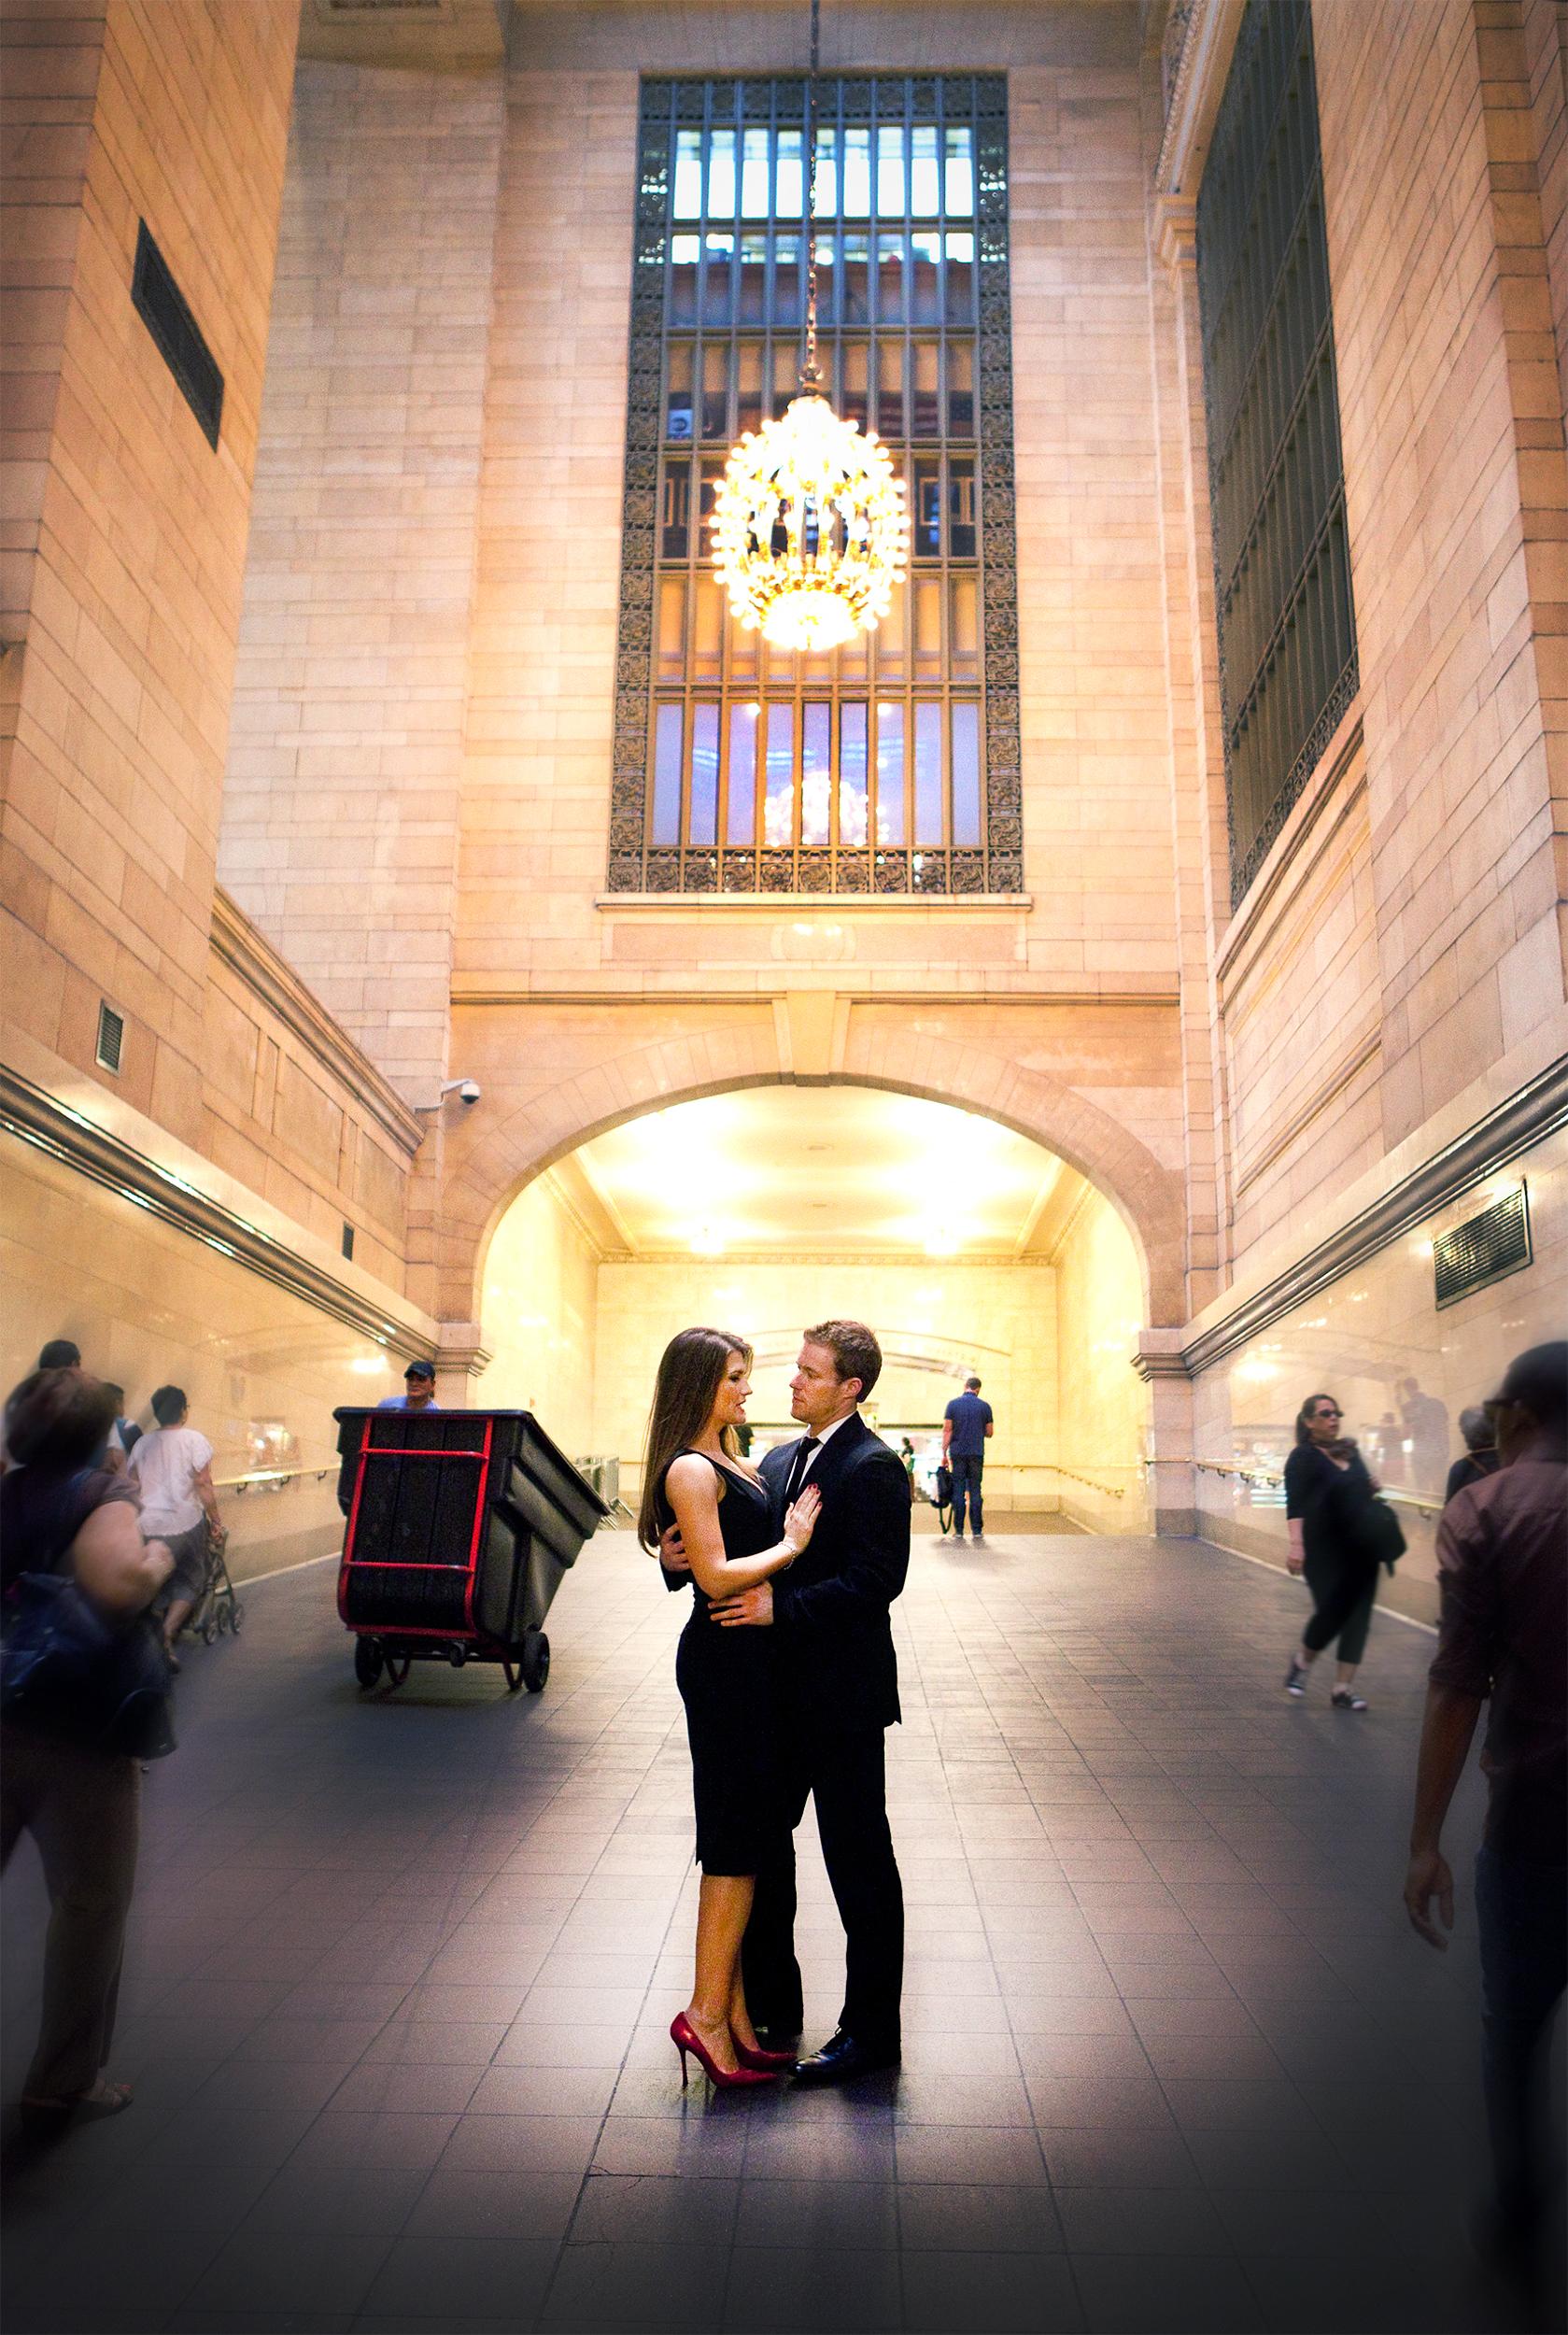 WEB_Grand Central Station NYC.jpg